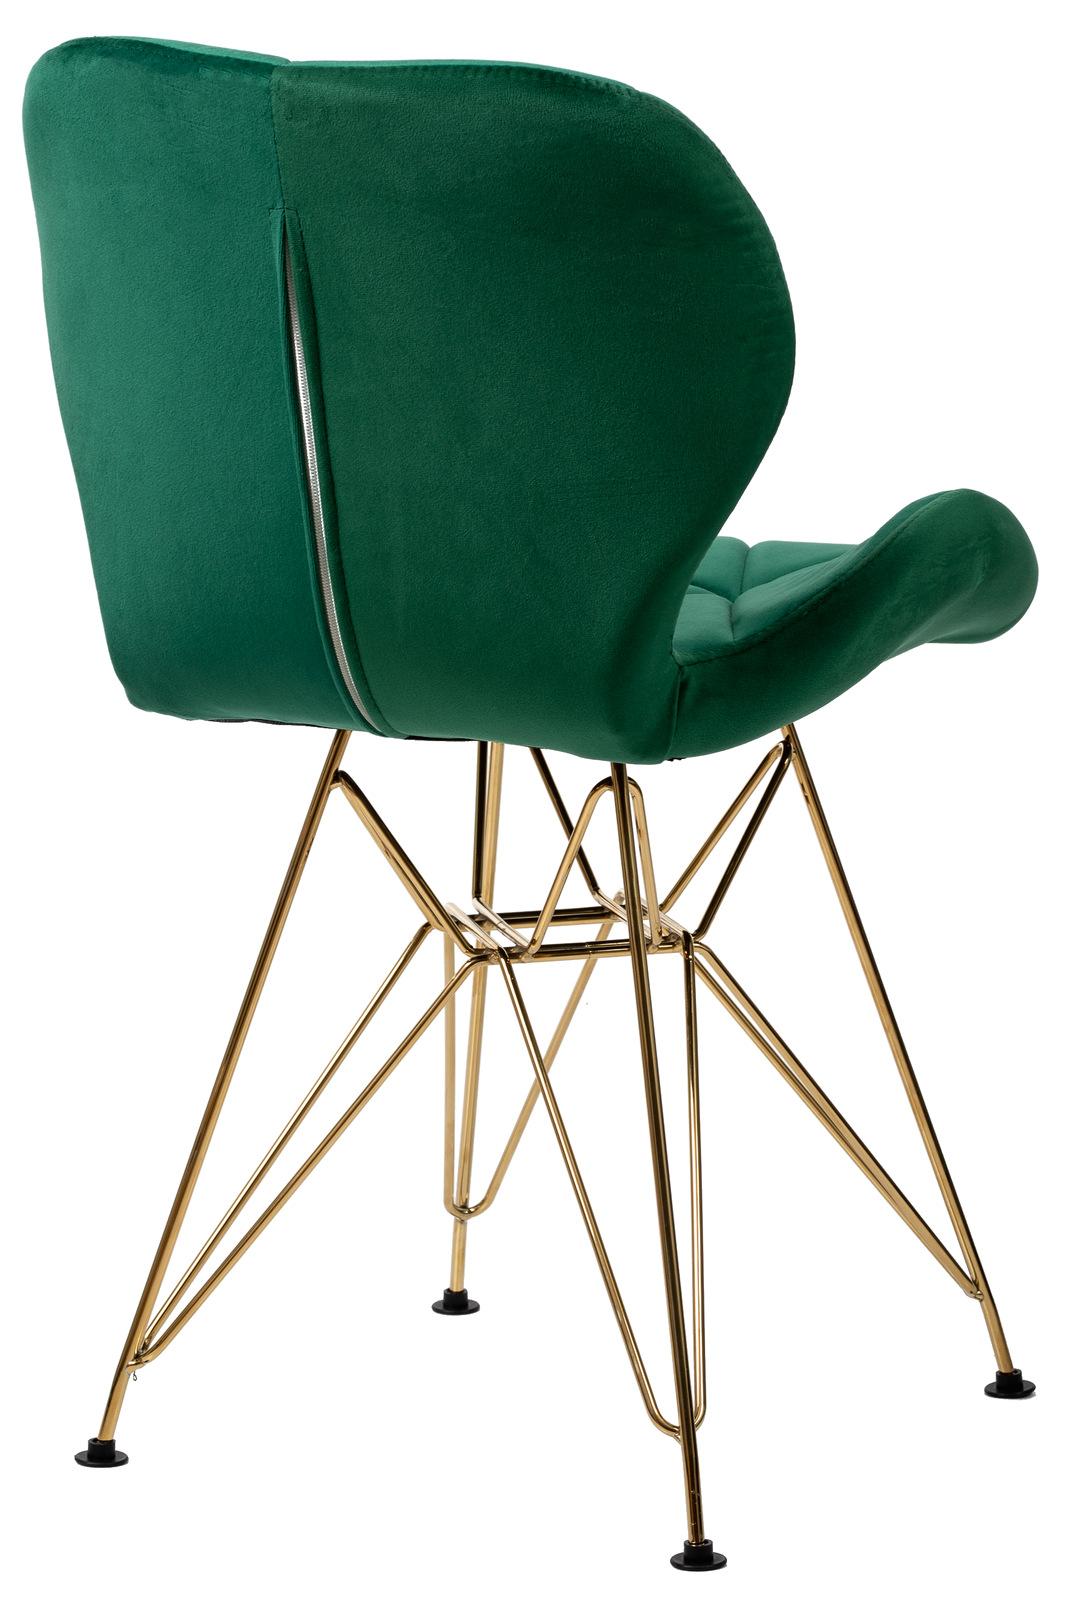 Szchara.pl - luxury furniture